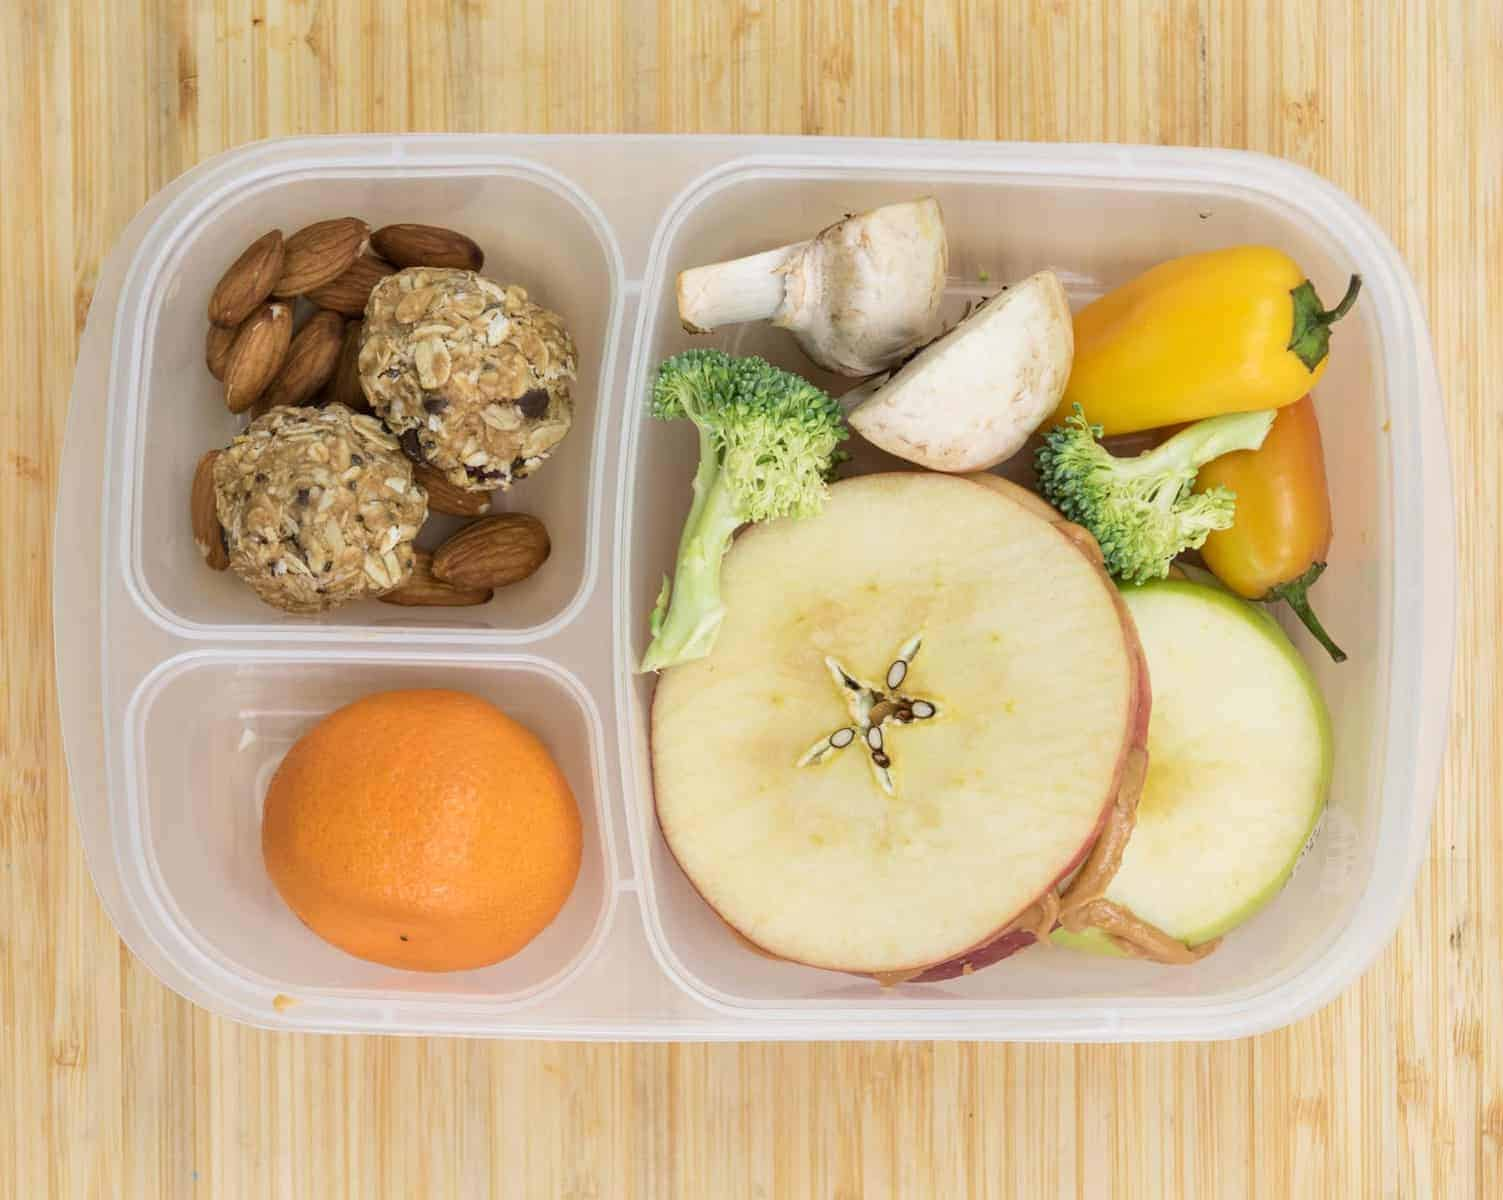 Lunch Box Ideas - Apple Sandwich Lunch Box